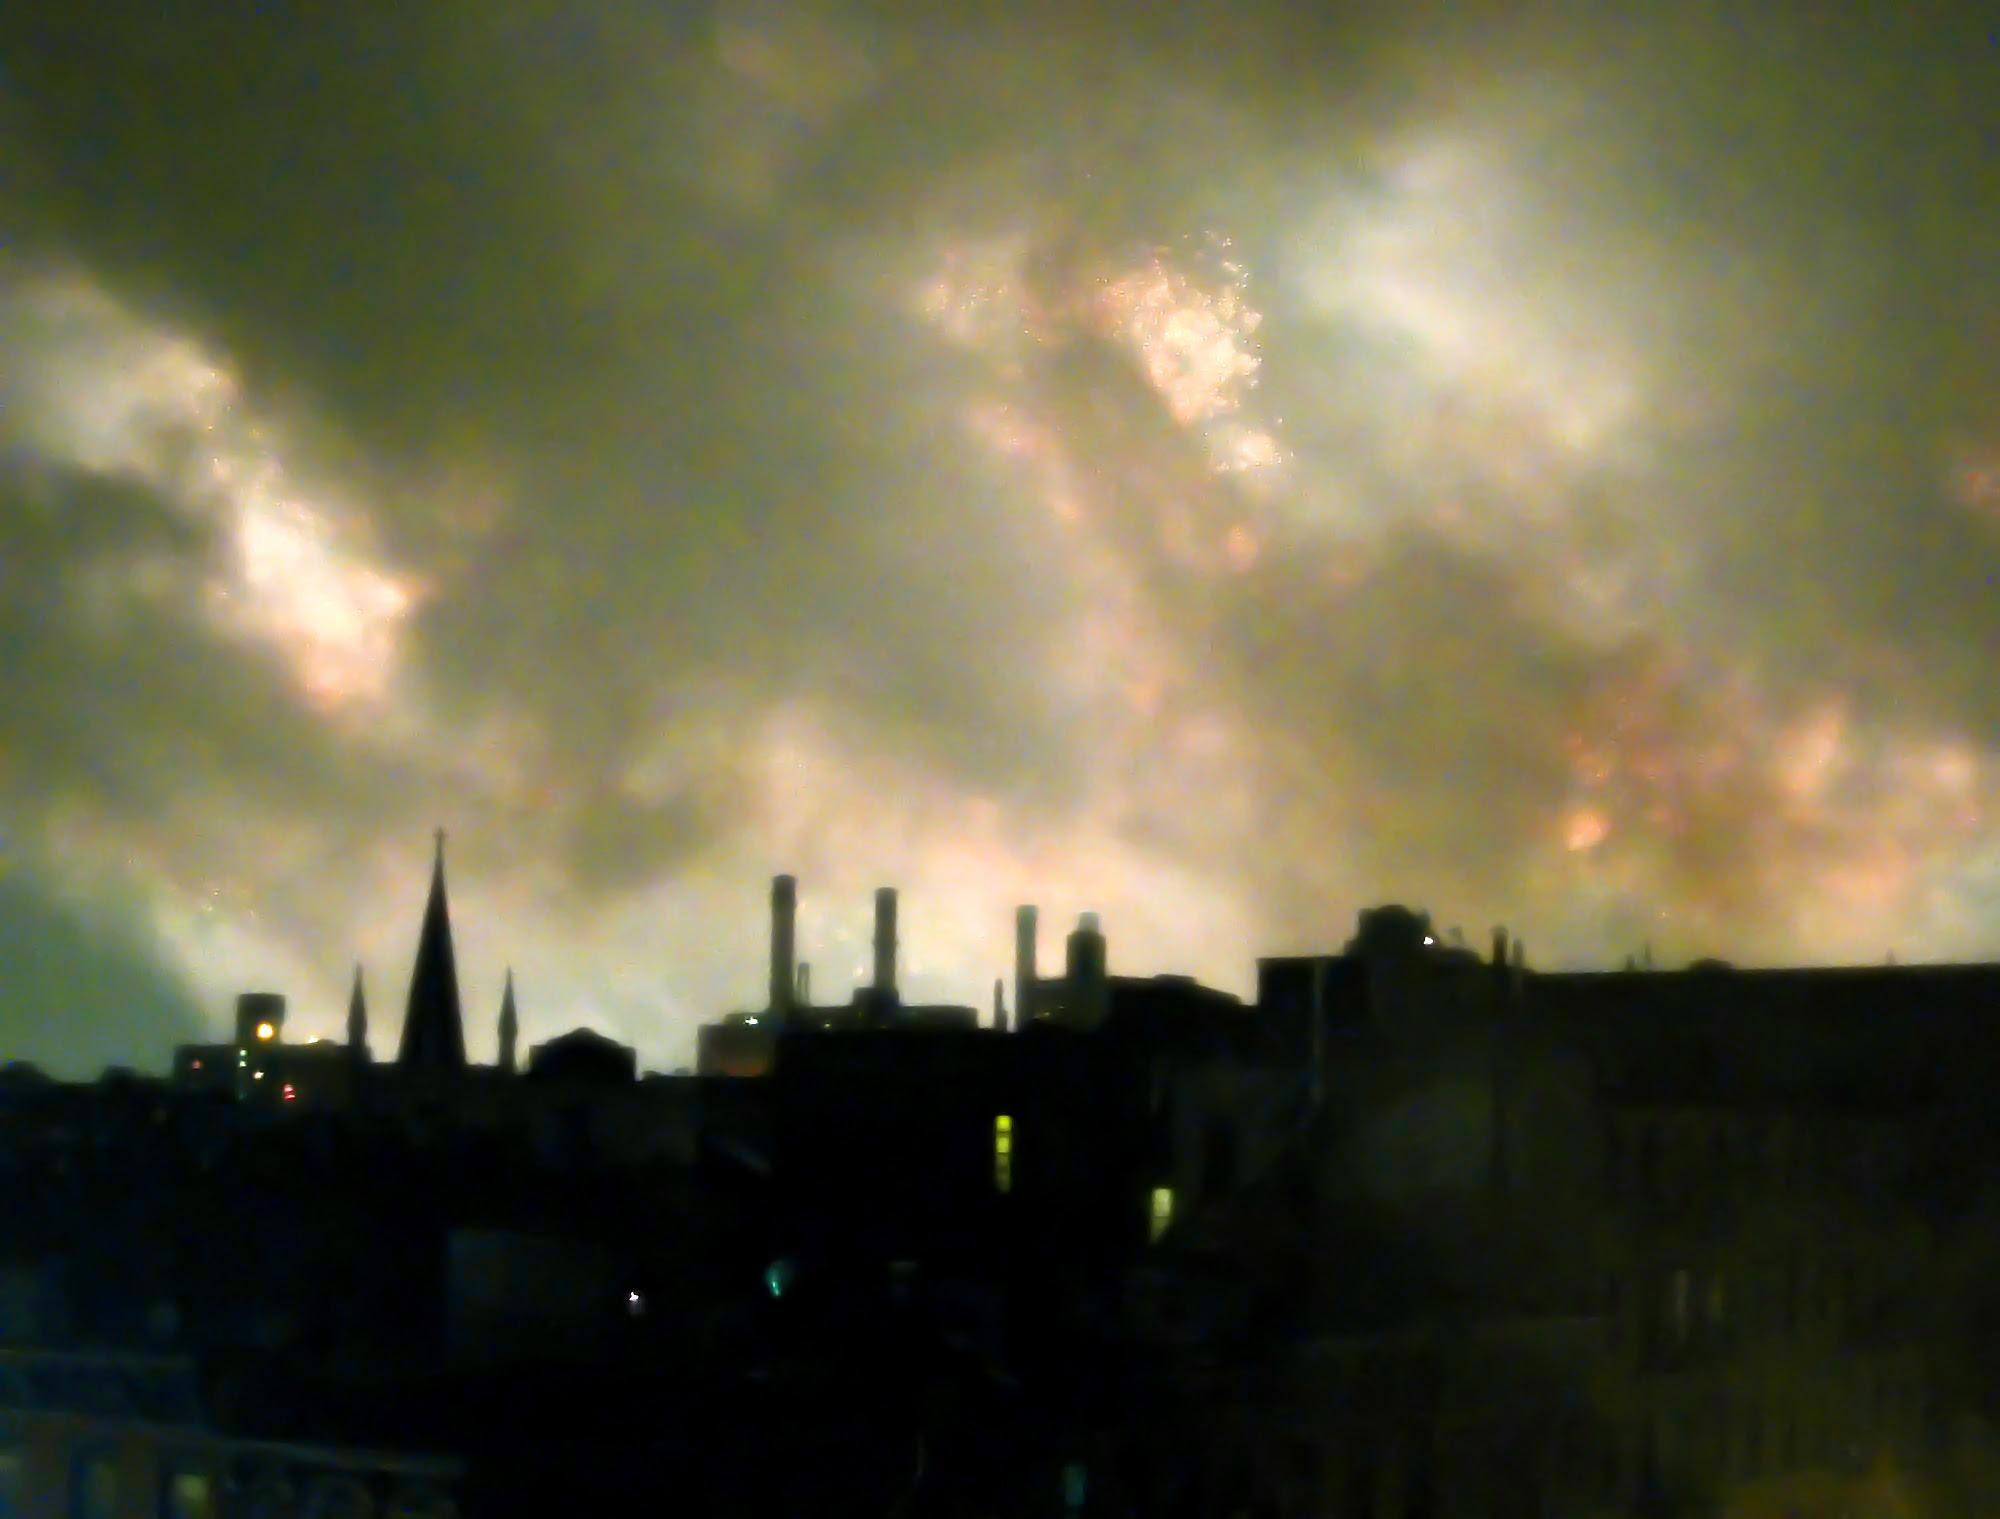 The East Village burns